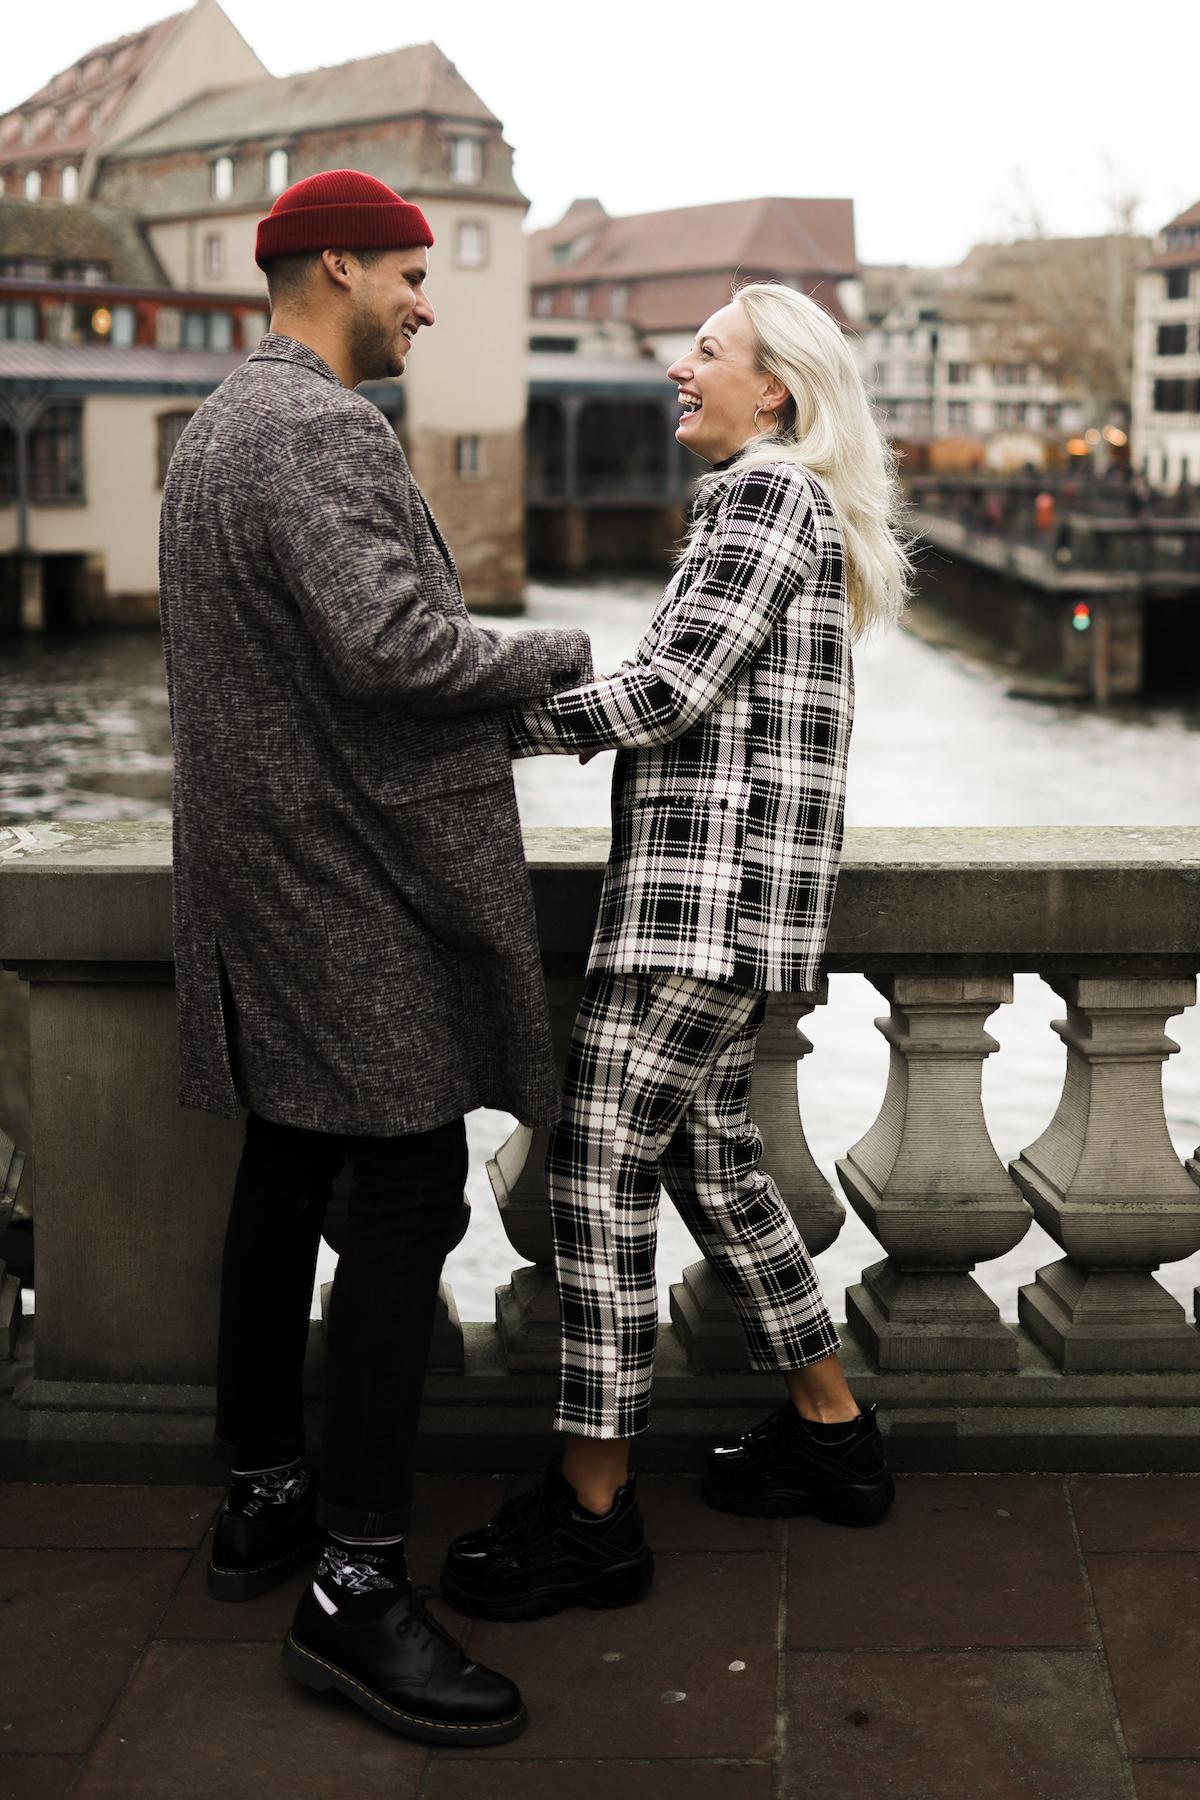 photographe-mariage-strasbourg-5.jpg